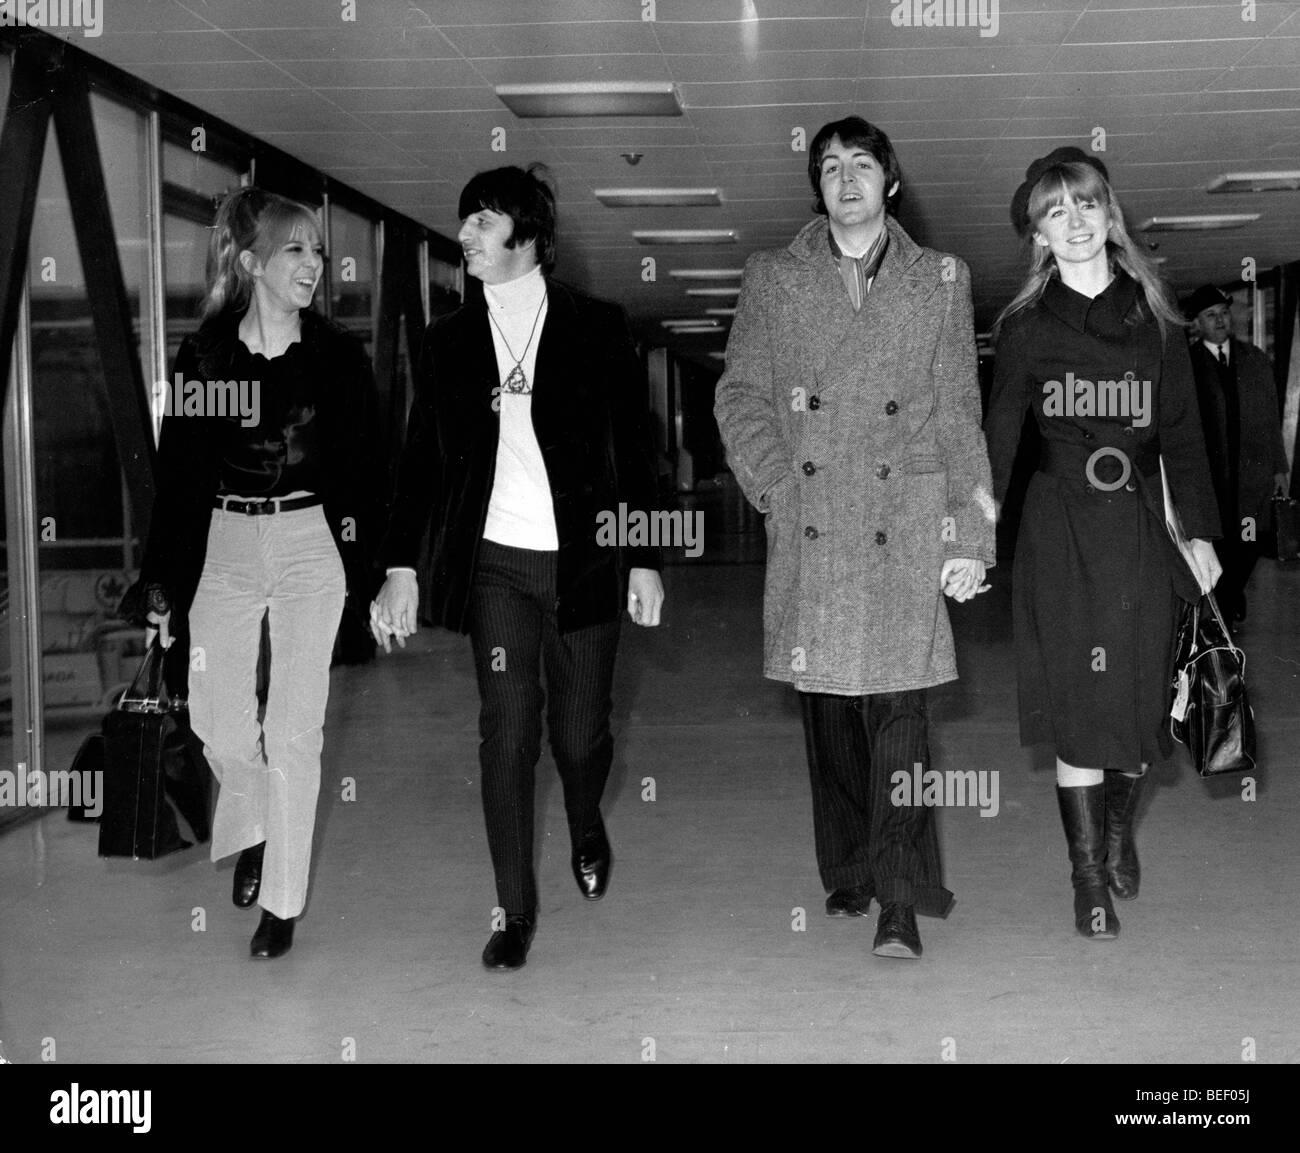 The Beatles Ringo Starr and Paul McCartney travel - Stock Image